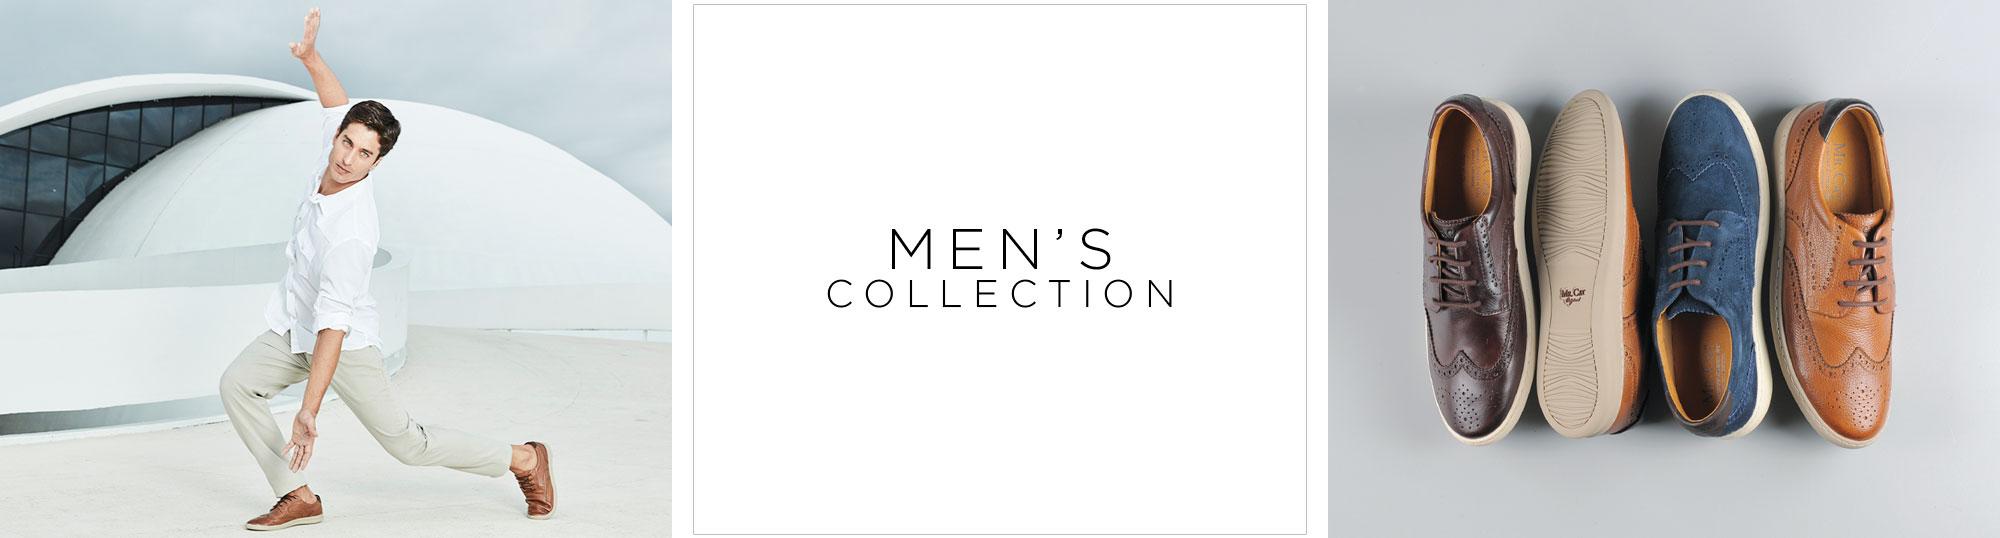 Banner -Men